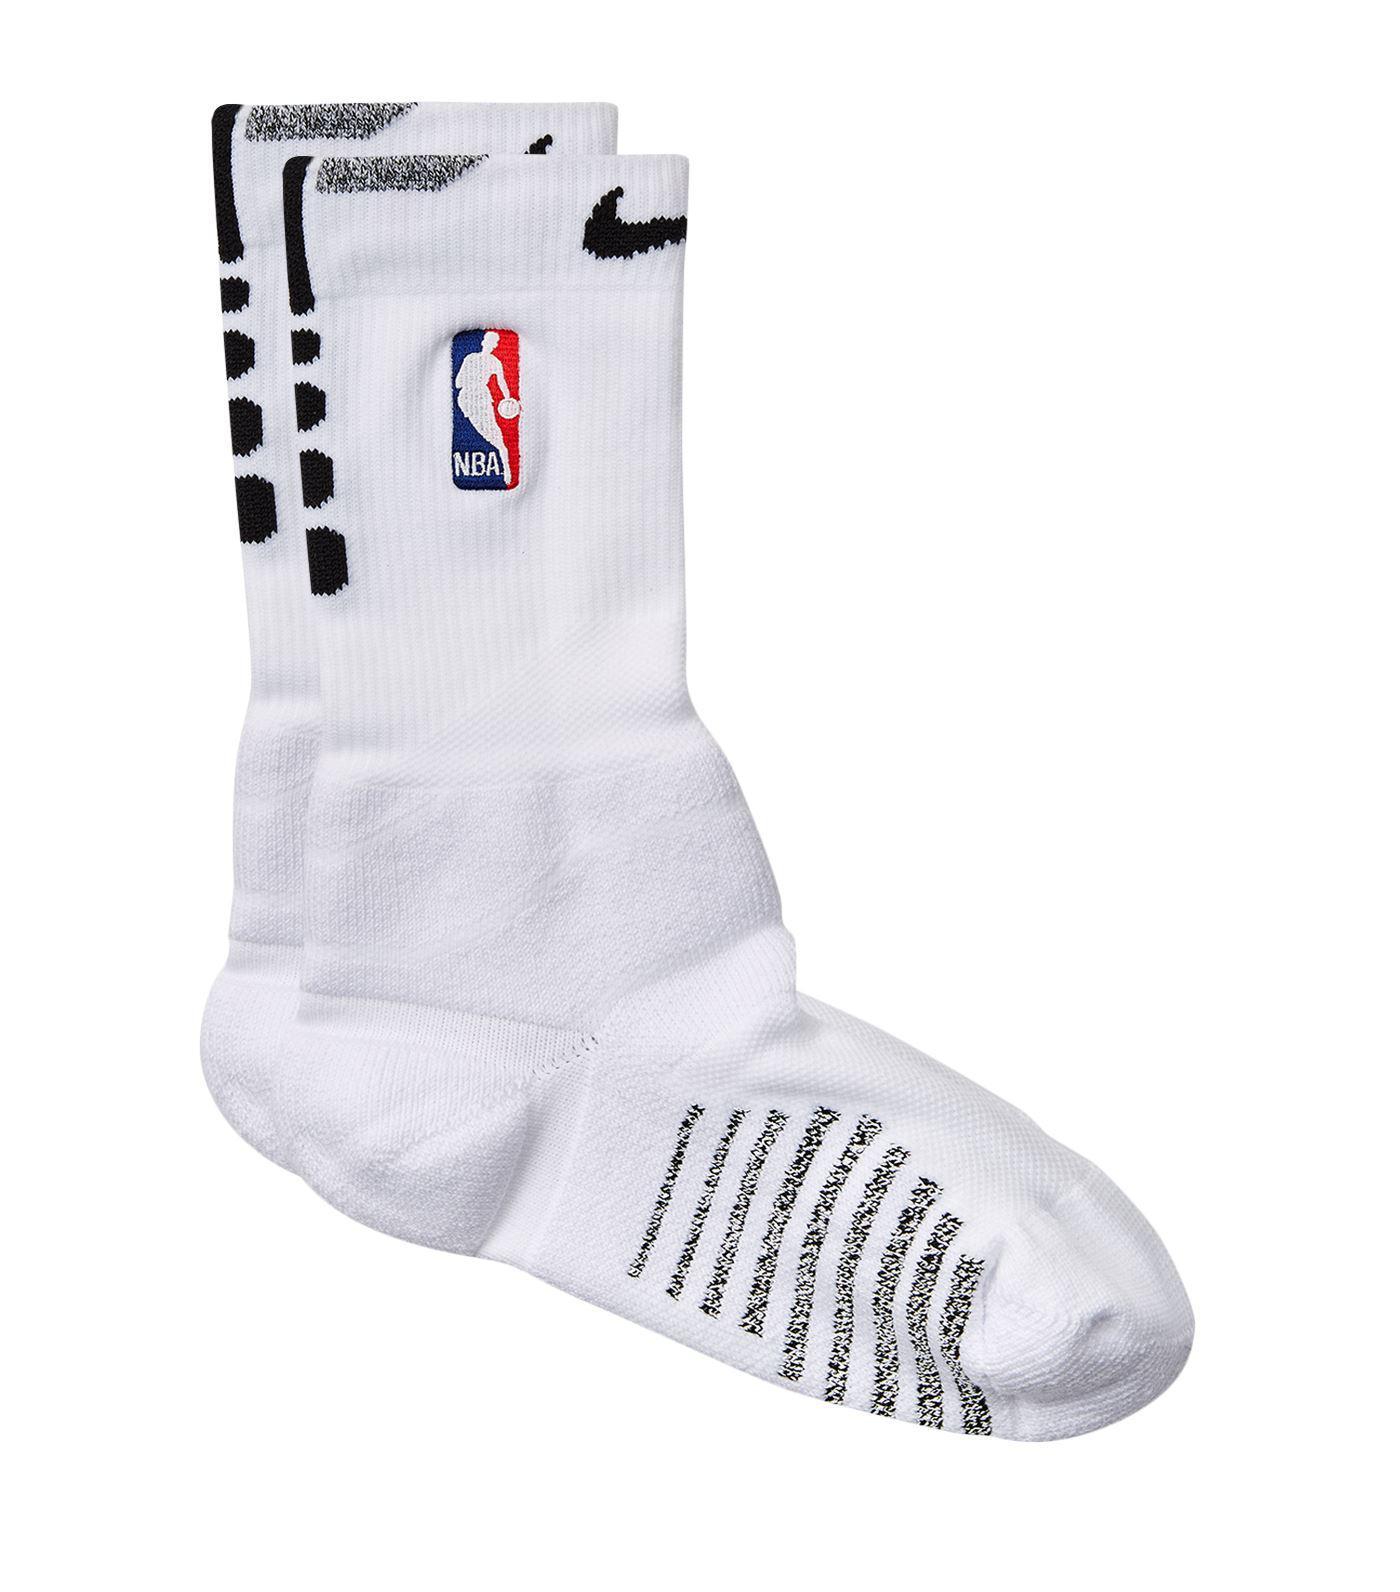 96ba3d7241c Nike NBA Elite Quick Crew Basketball Socks. noImageFound. Previous. Gallery